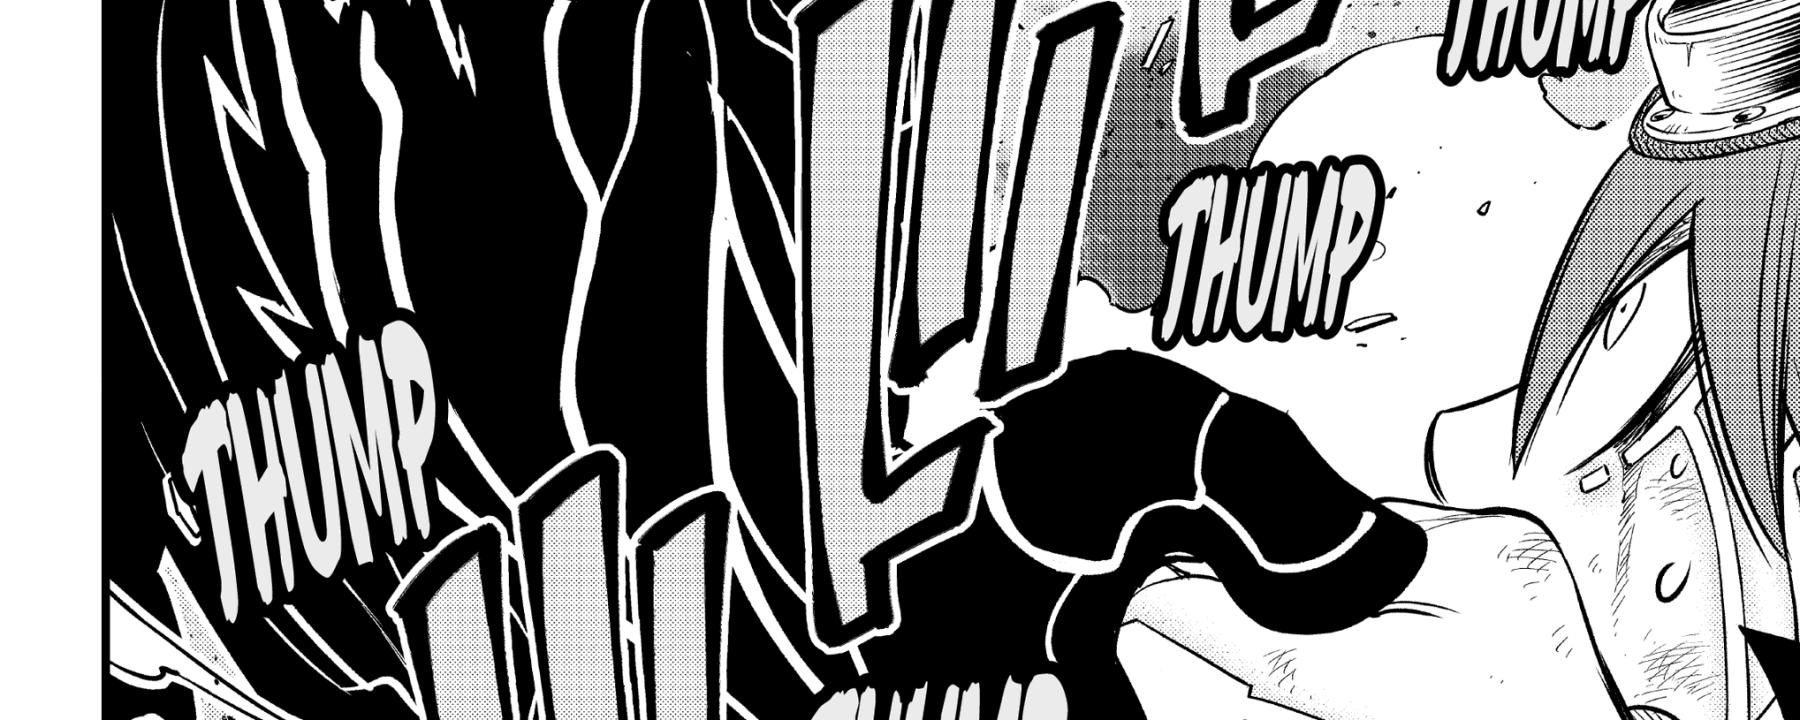 Edens Zero Chapter 95 Drakken Joe's Overdrive